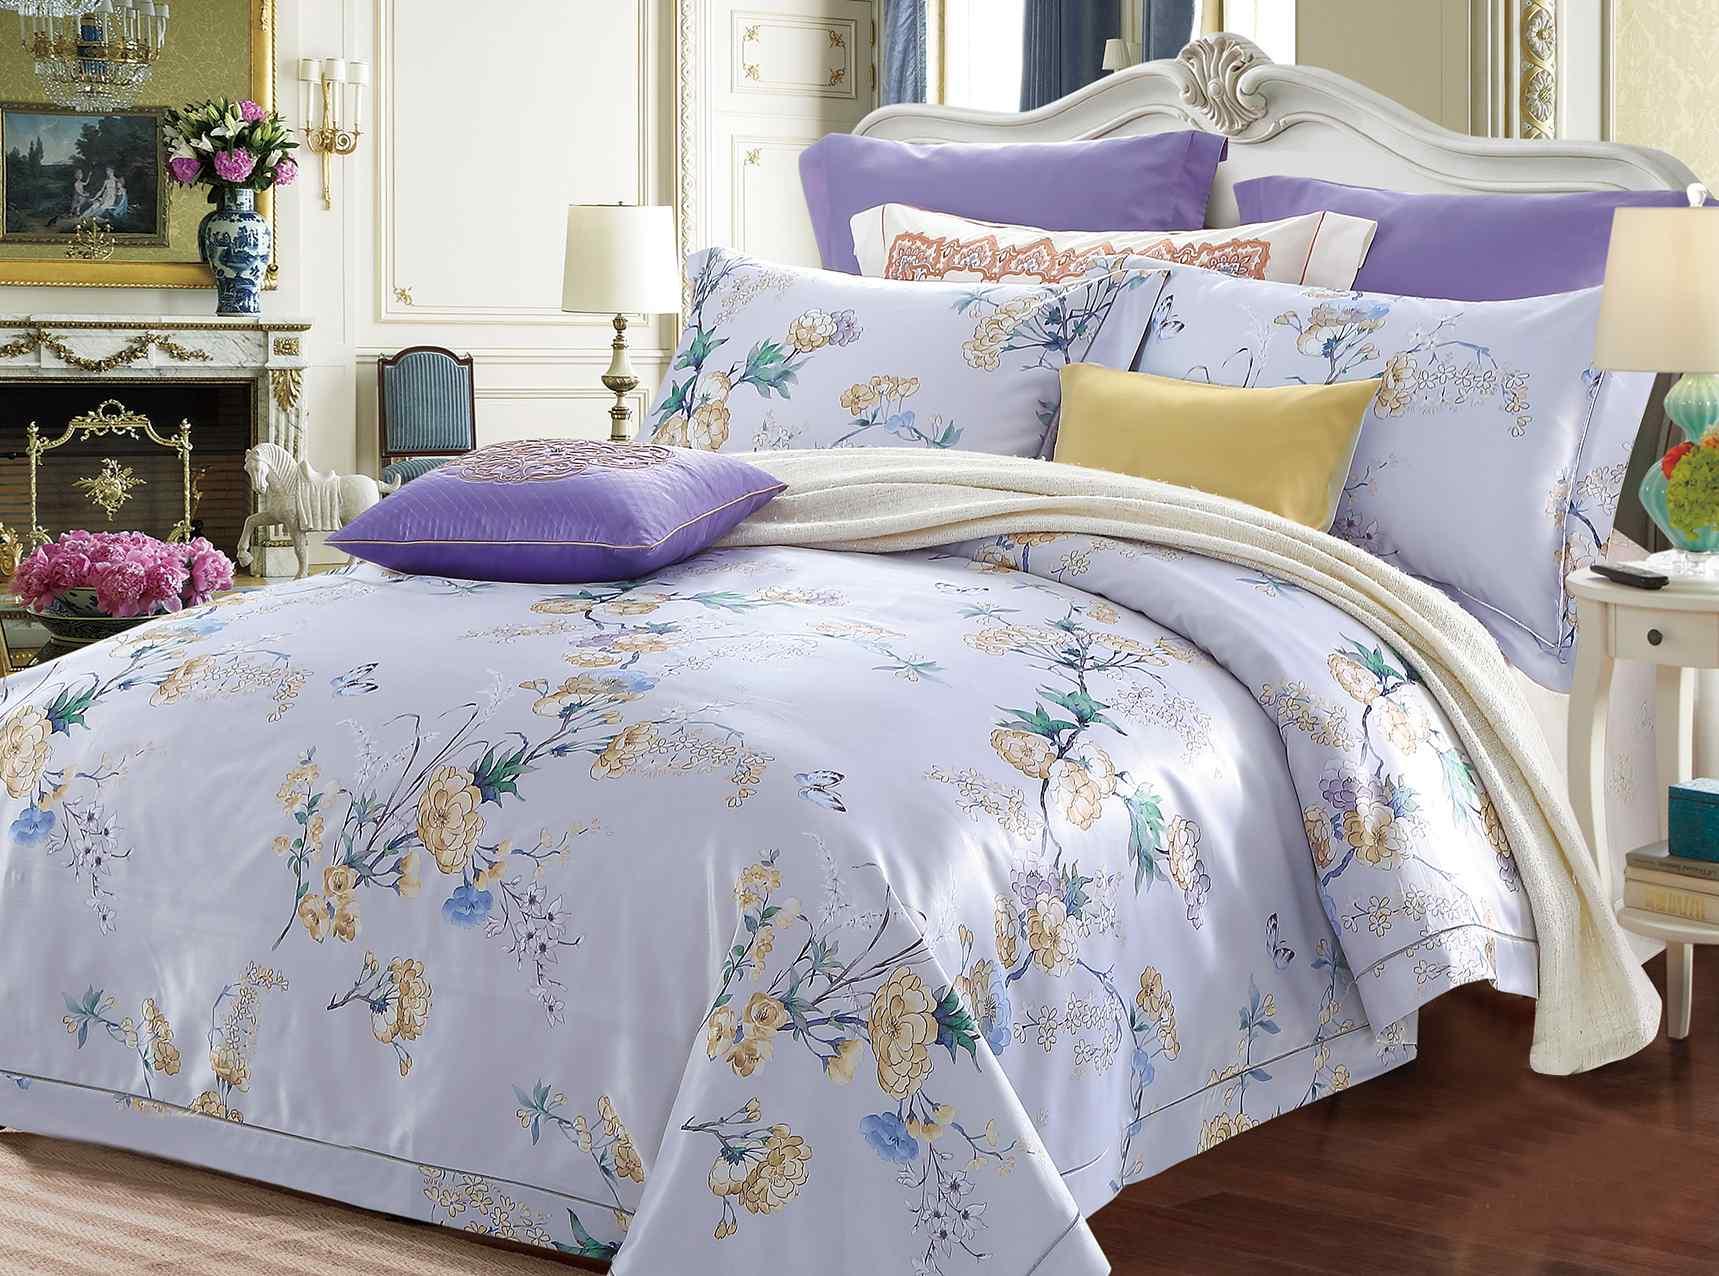 Floral Pattern Polyester Rayon Jacquard Bedding   #6848